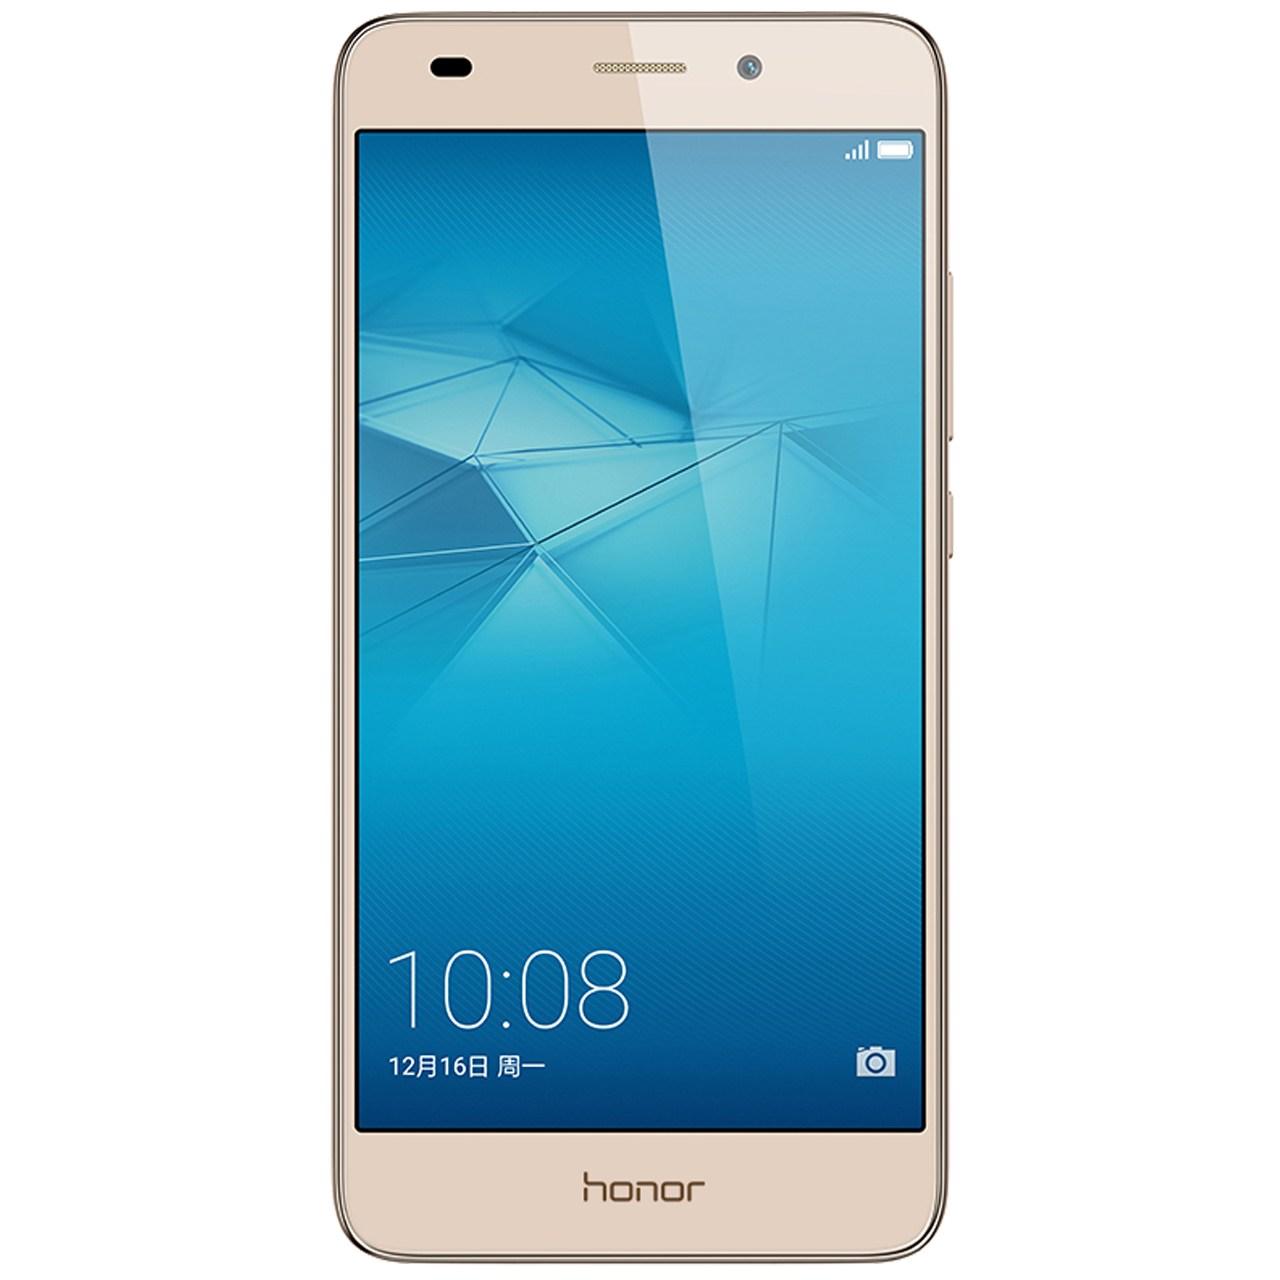 گوشی موبایل Honor 5c دو سیم کارت